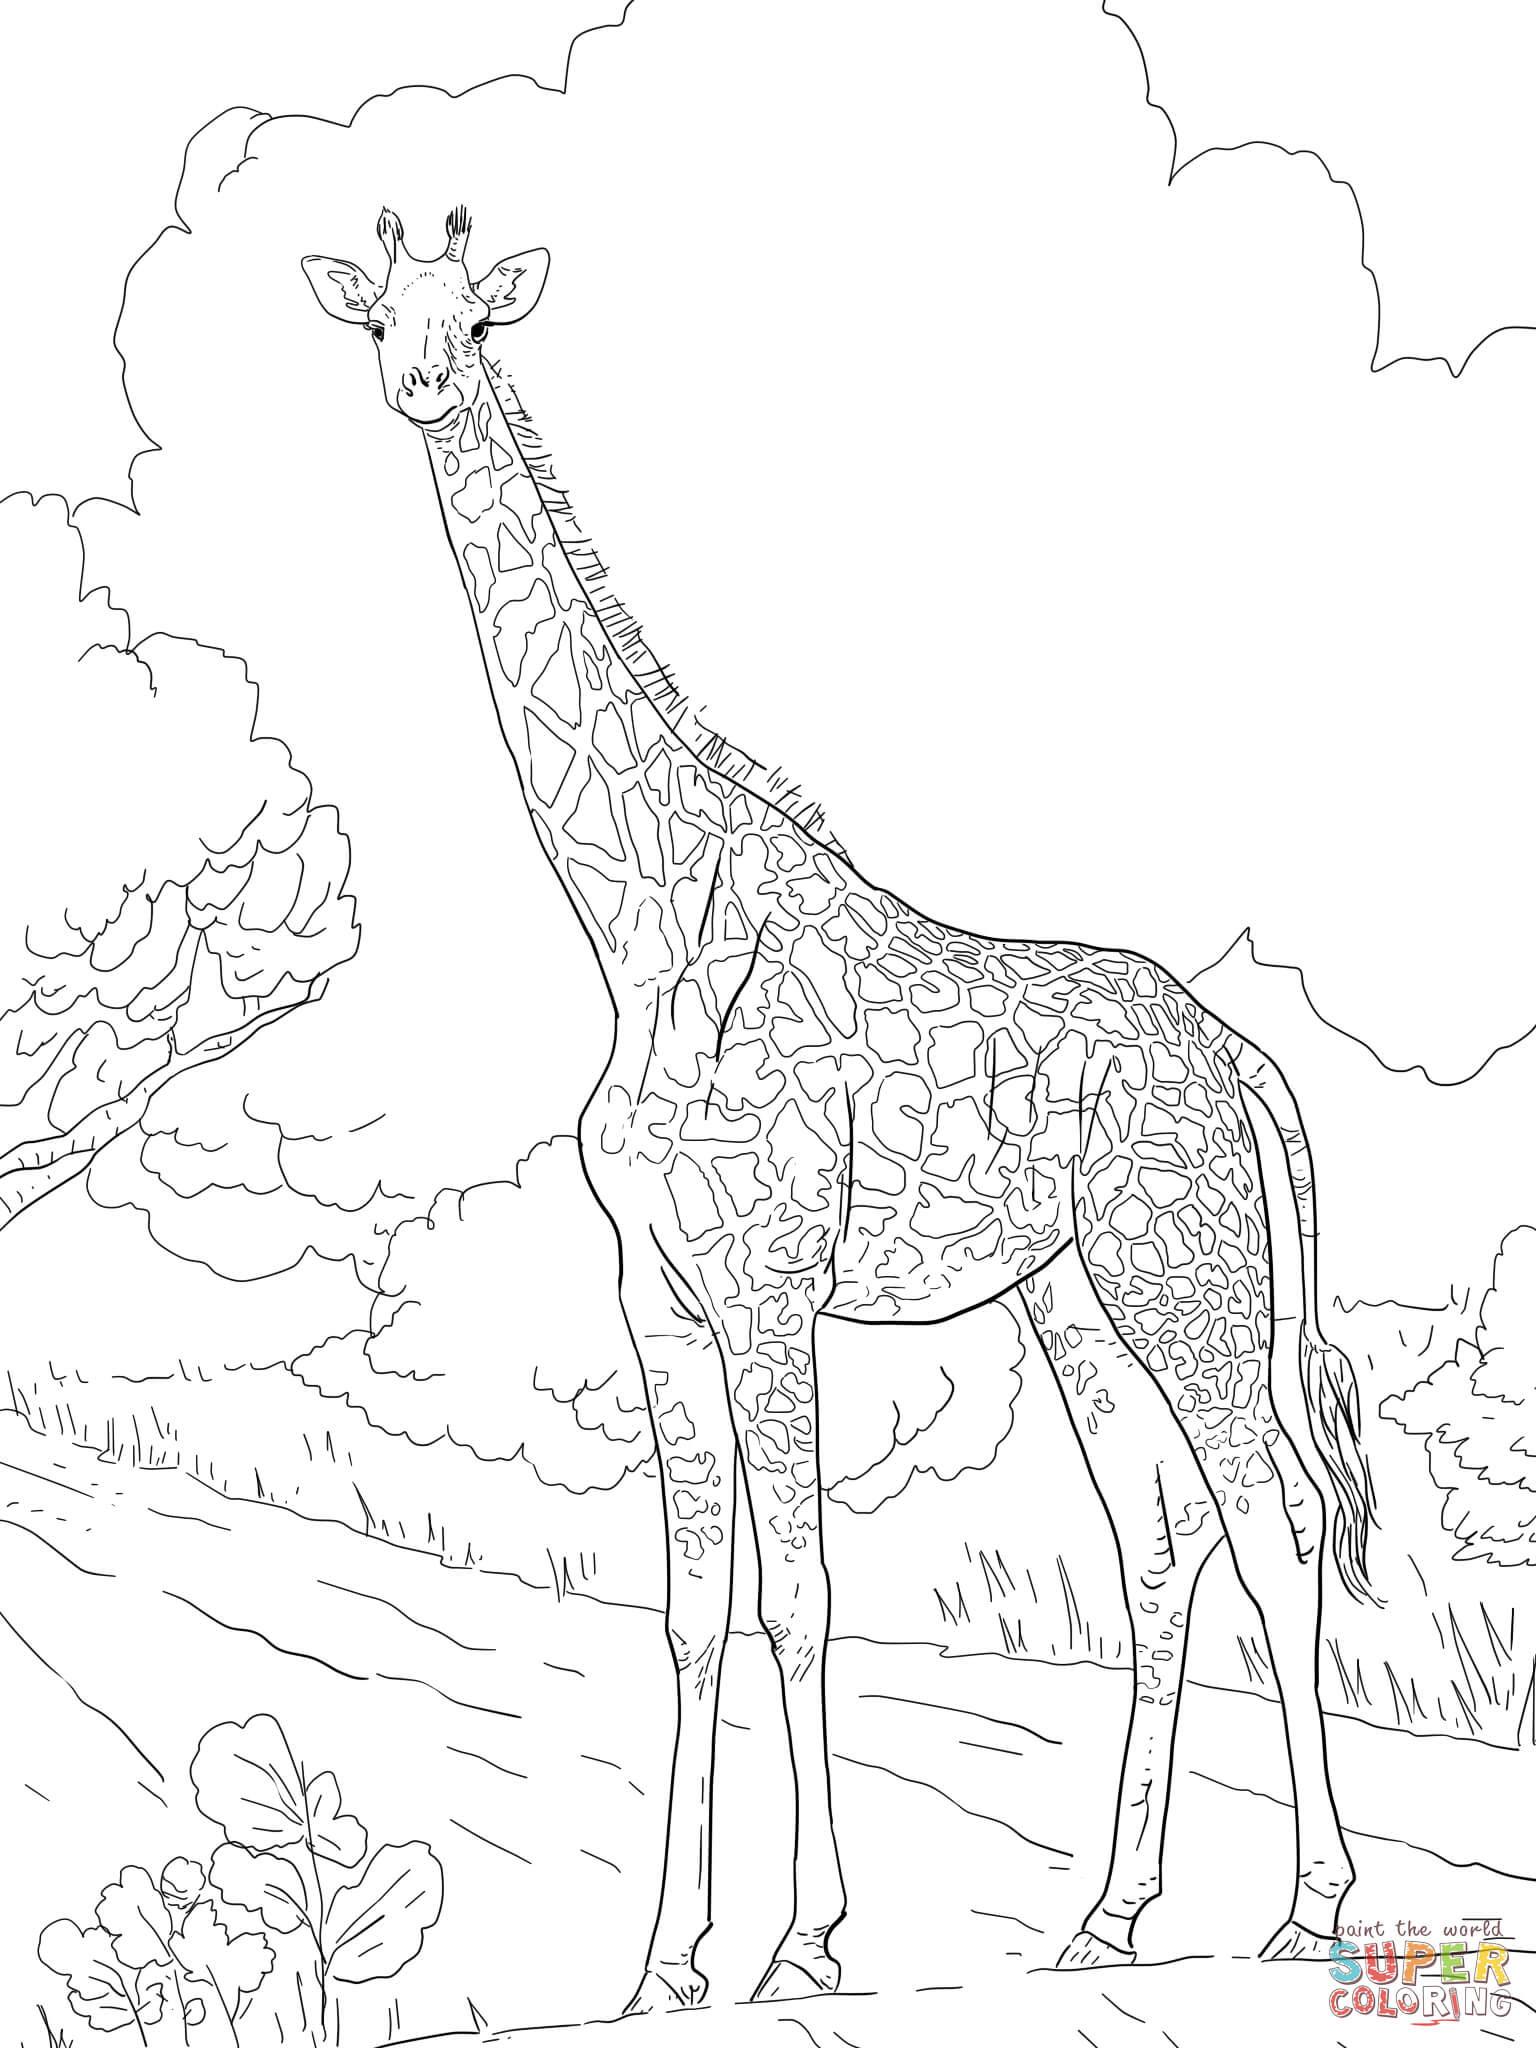 Female Masai Giraffe coloring page | Free Printable ...